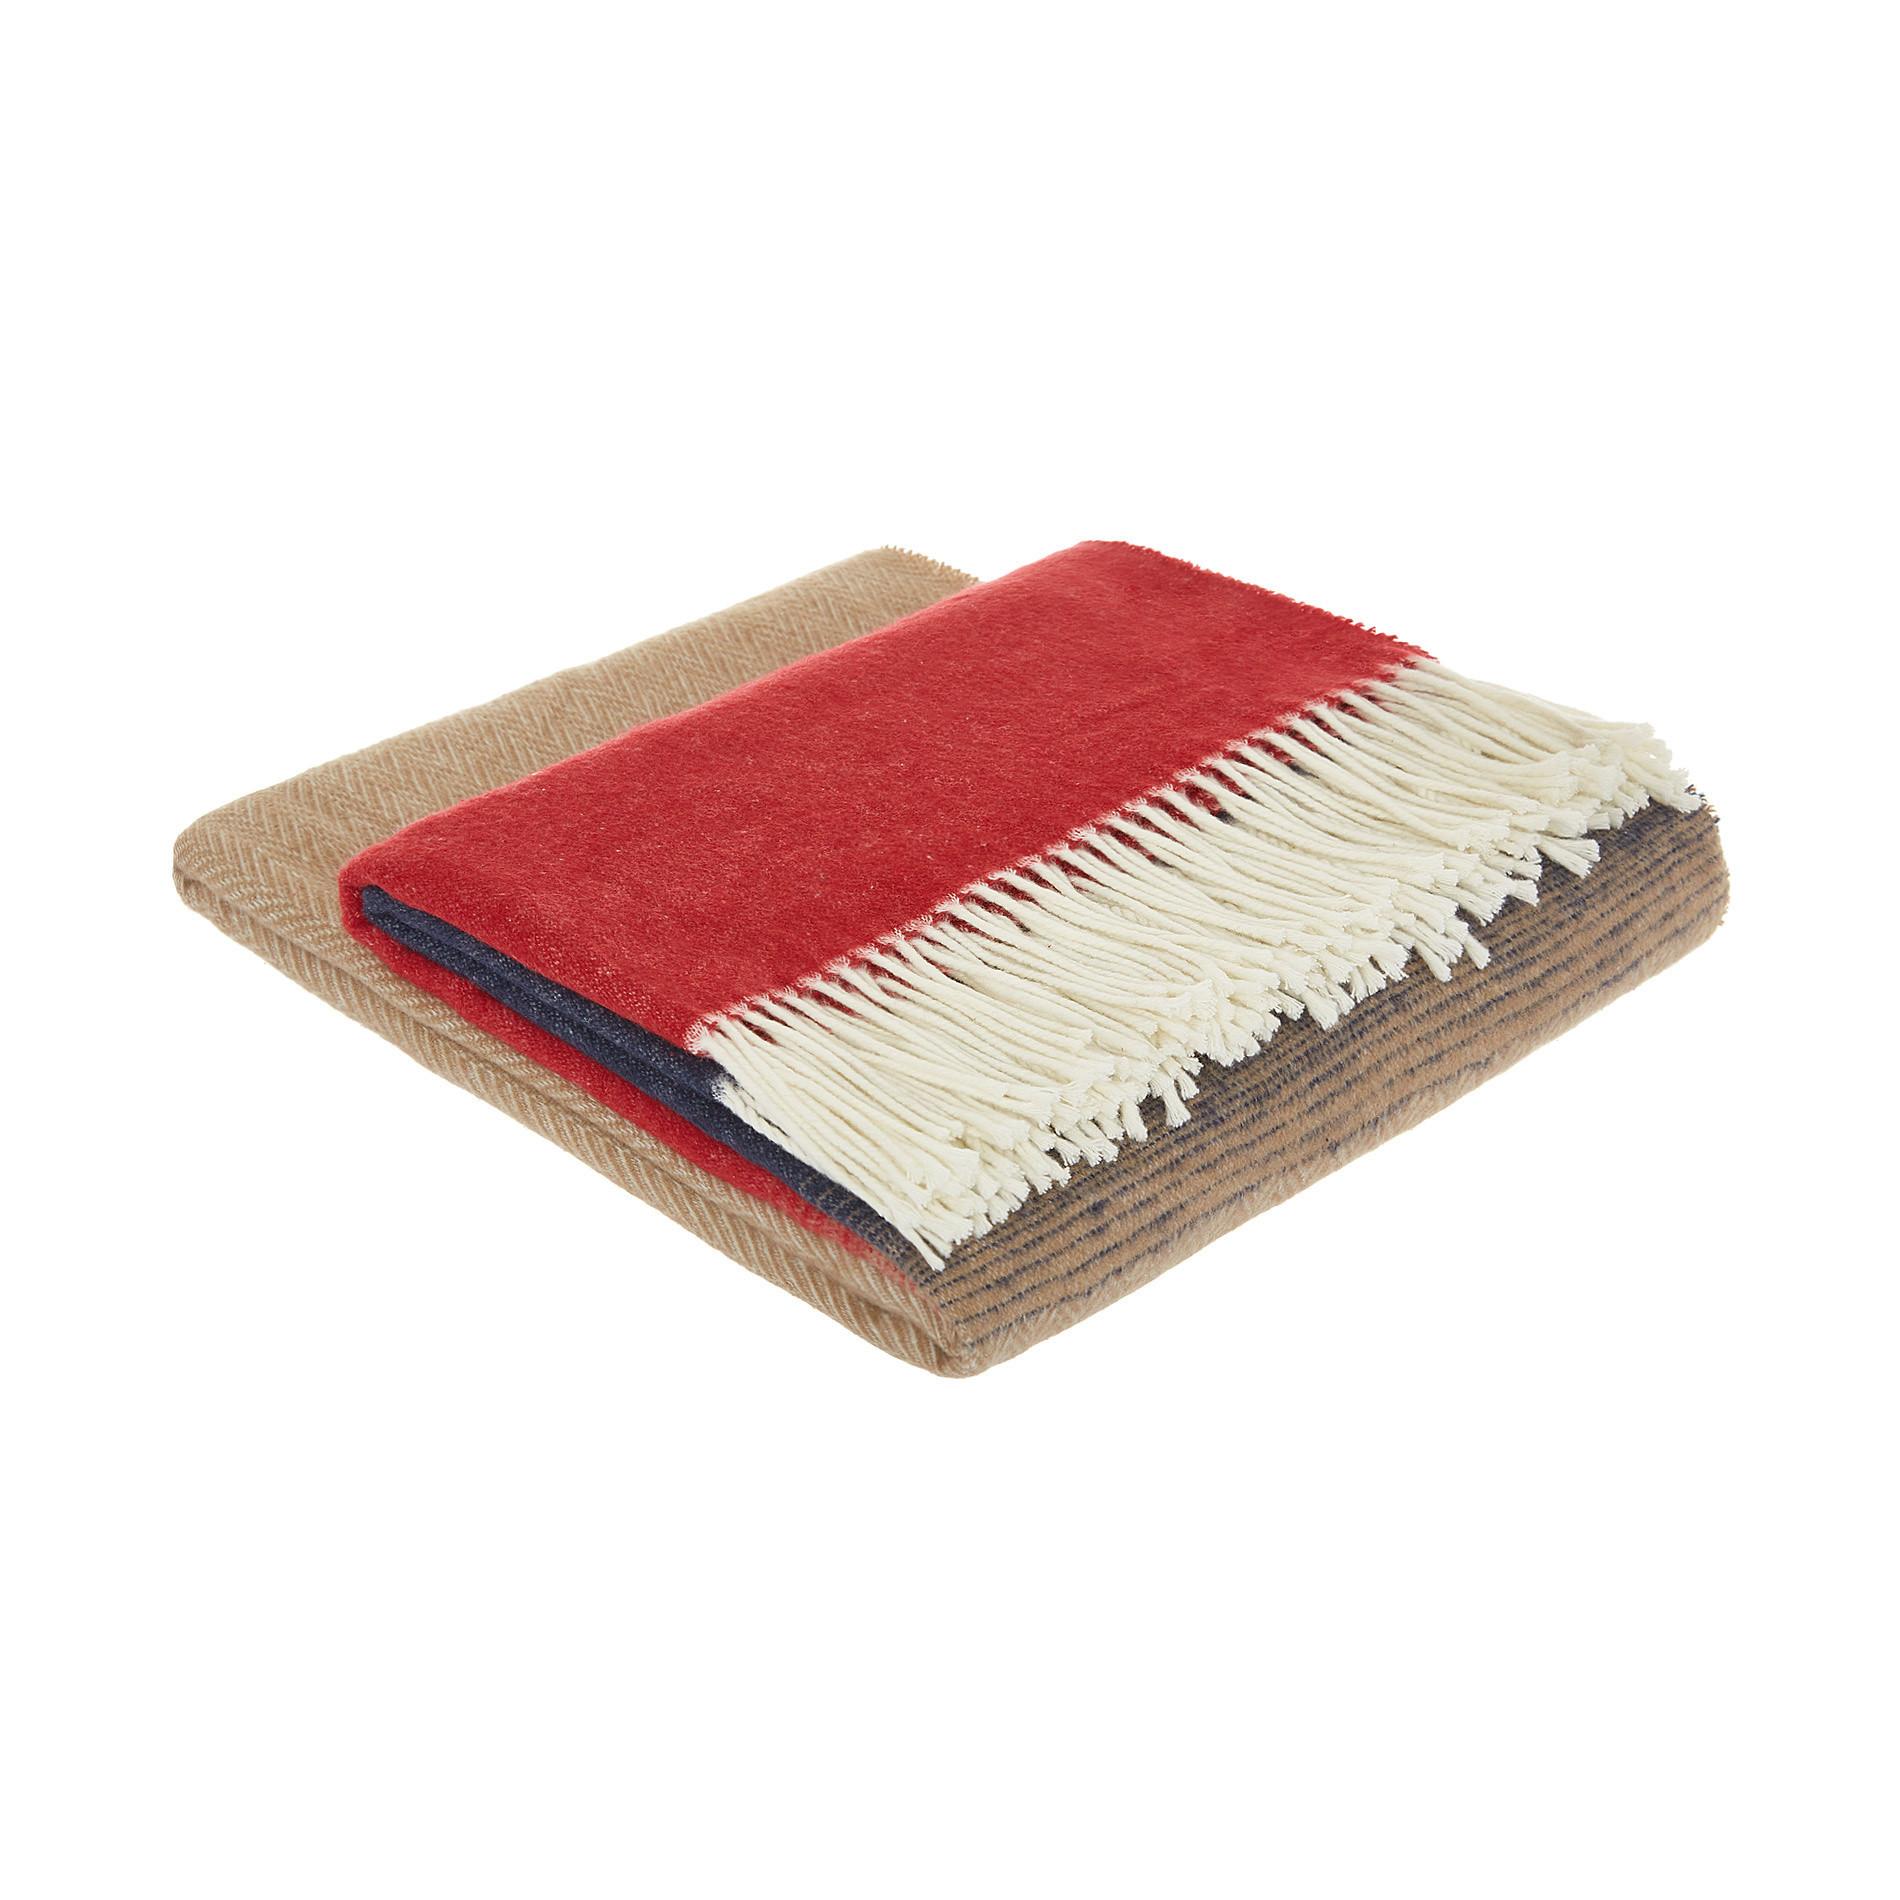 Plaid misto cotone con frange, Rosso, large image number 0